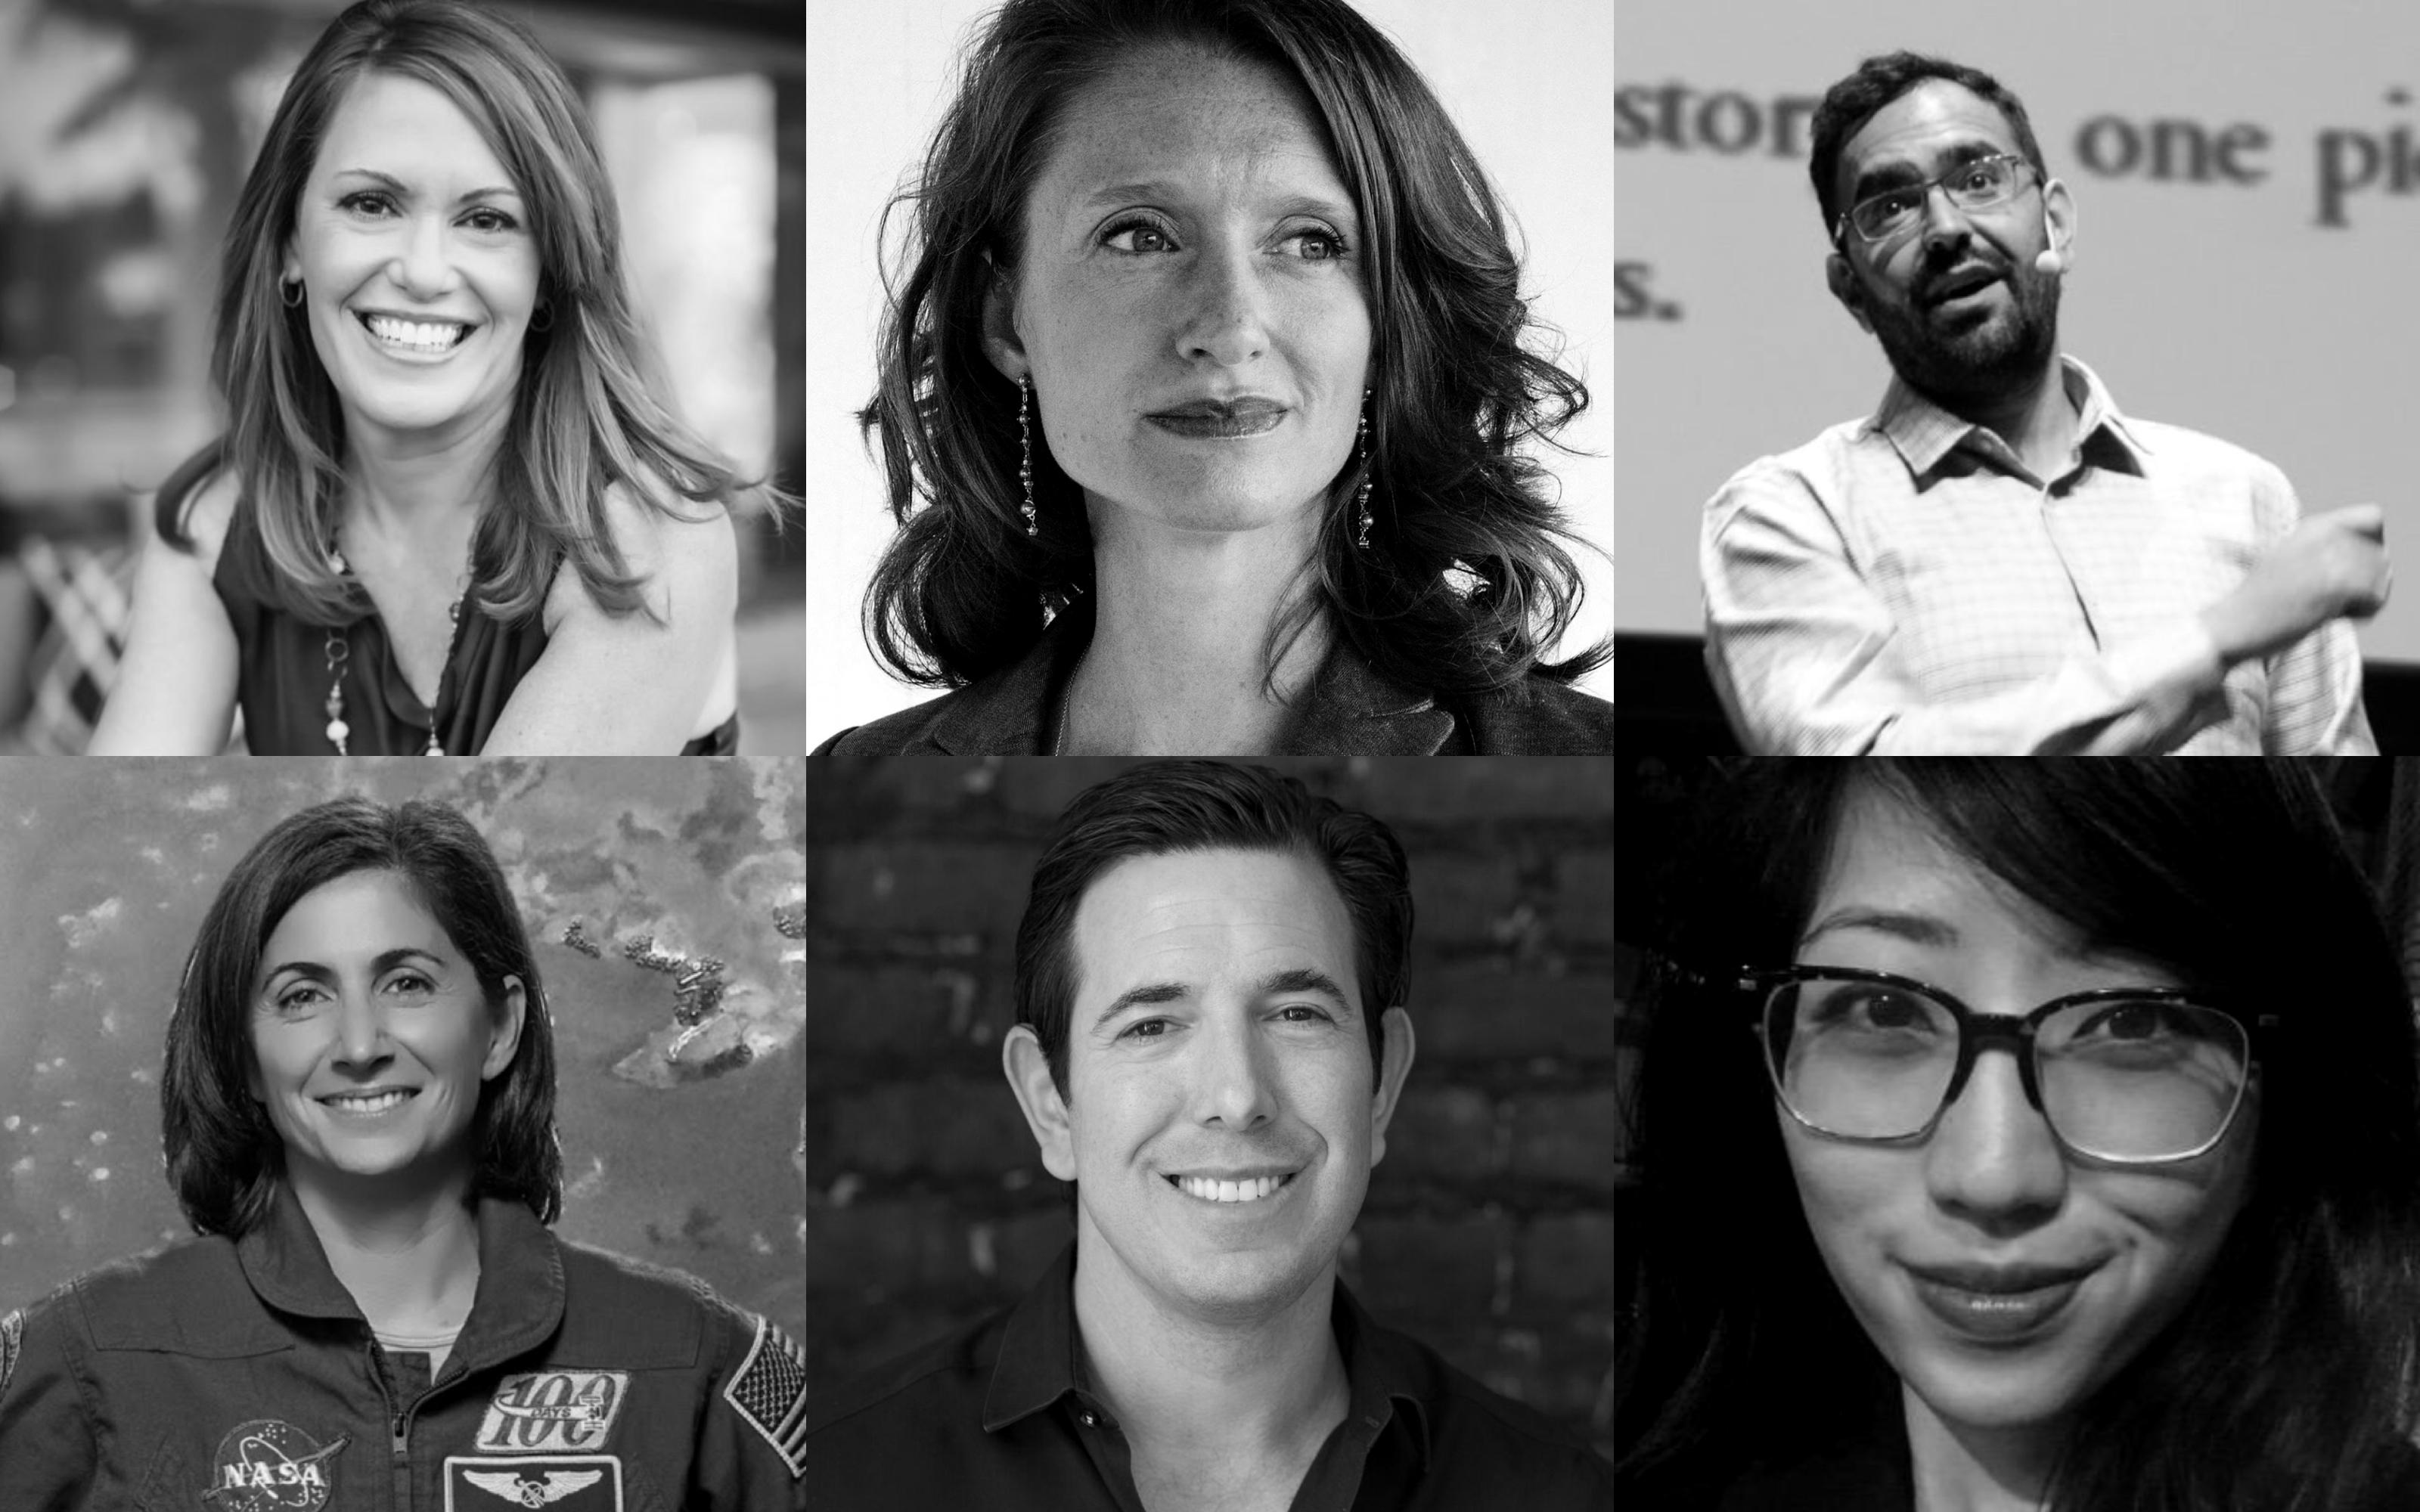 Quartz Pros: Peggy Johnson, Nicole Stott, Natasha Lamb, Azeem Azhar, Suzy Ryoo, Bradley Tusk